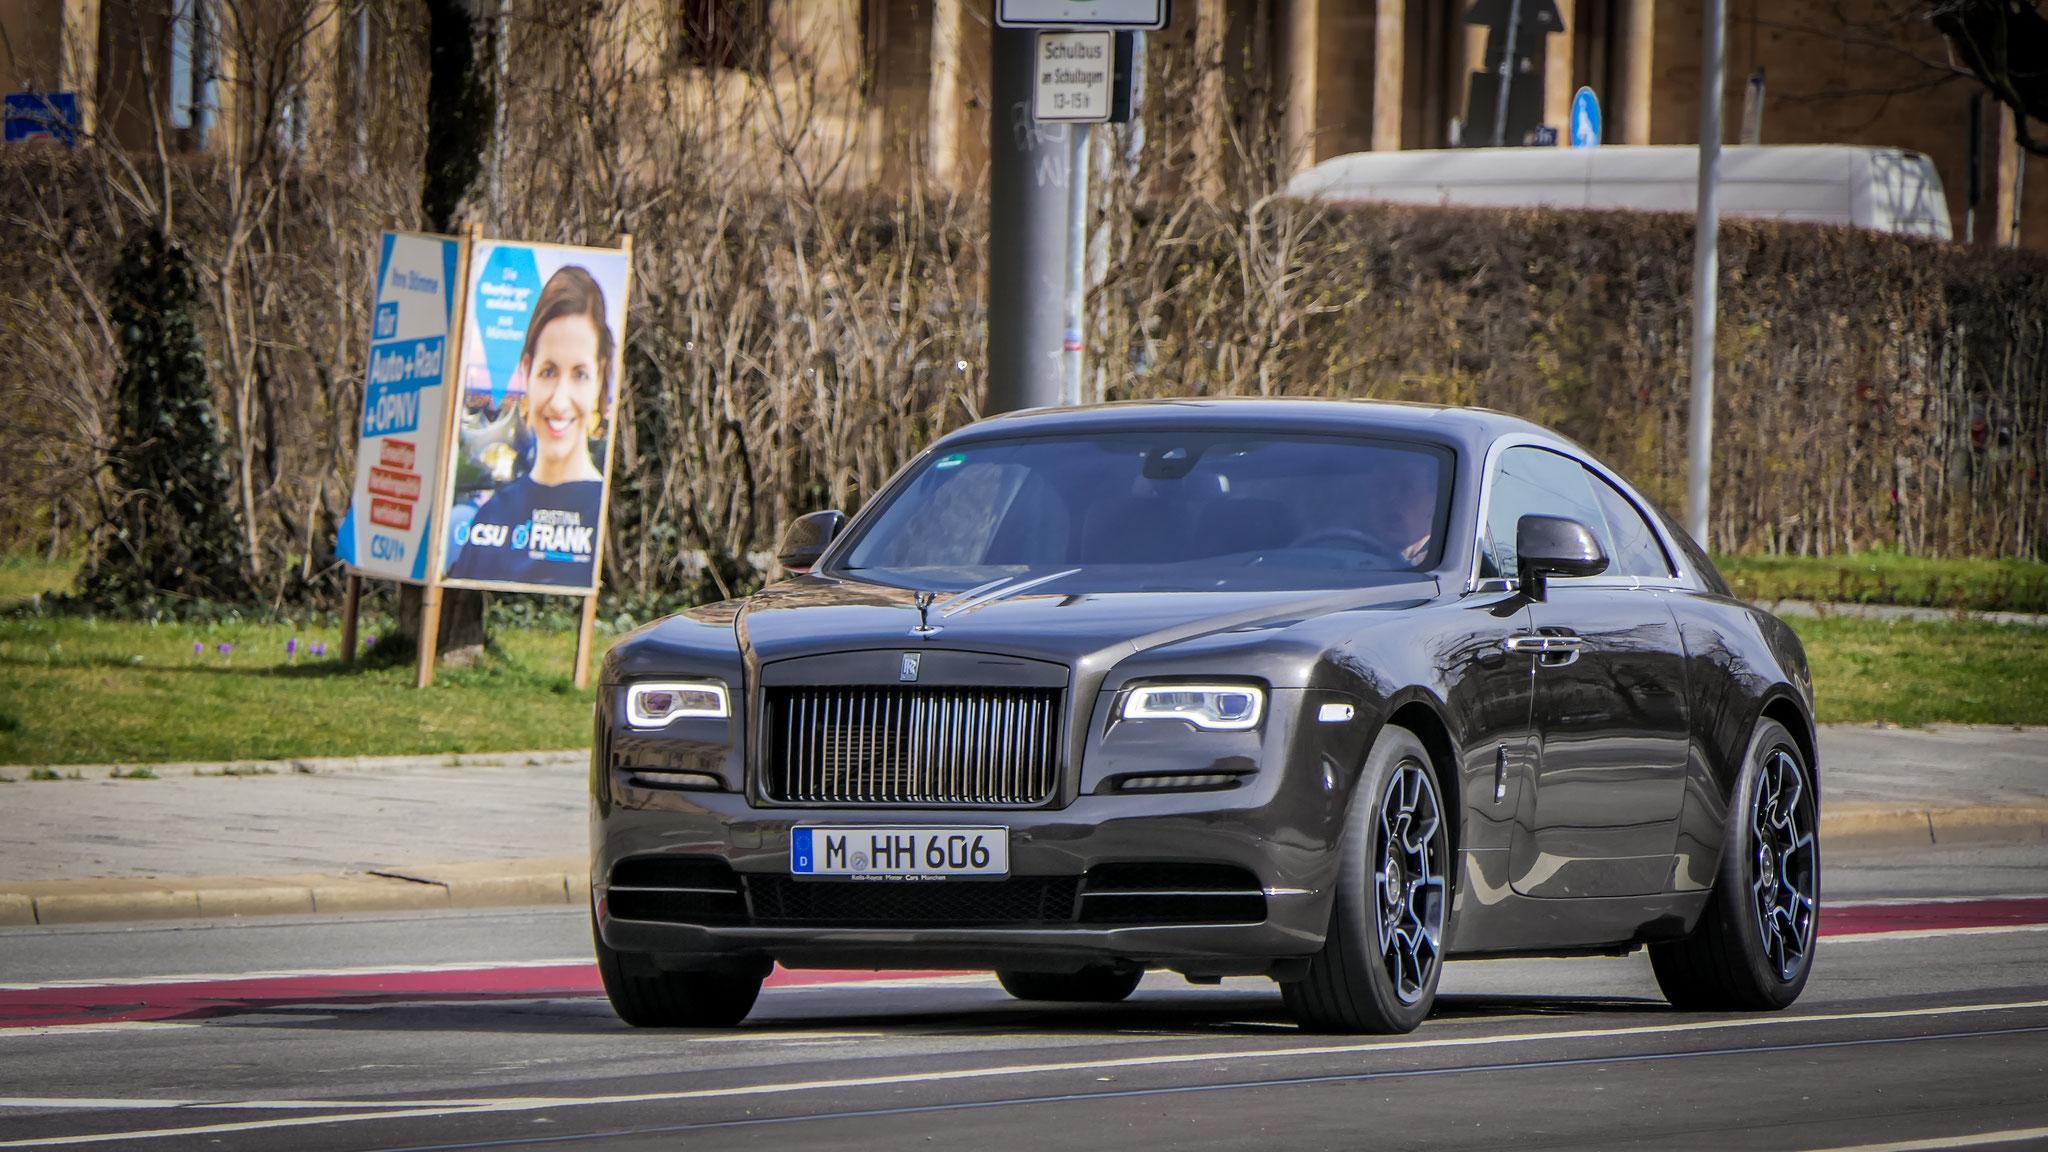 Rolls Royce Wraith Black Badge - M-HH-606